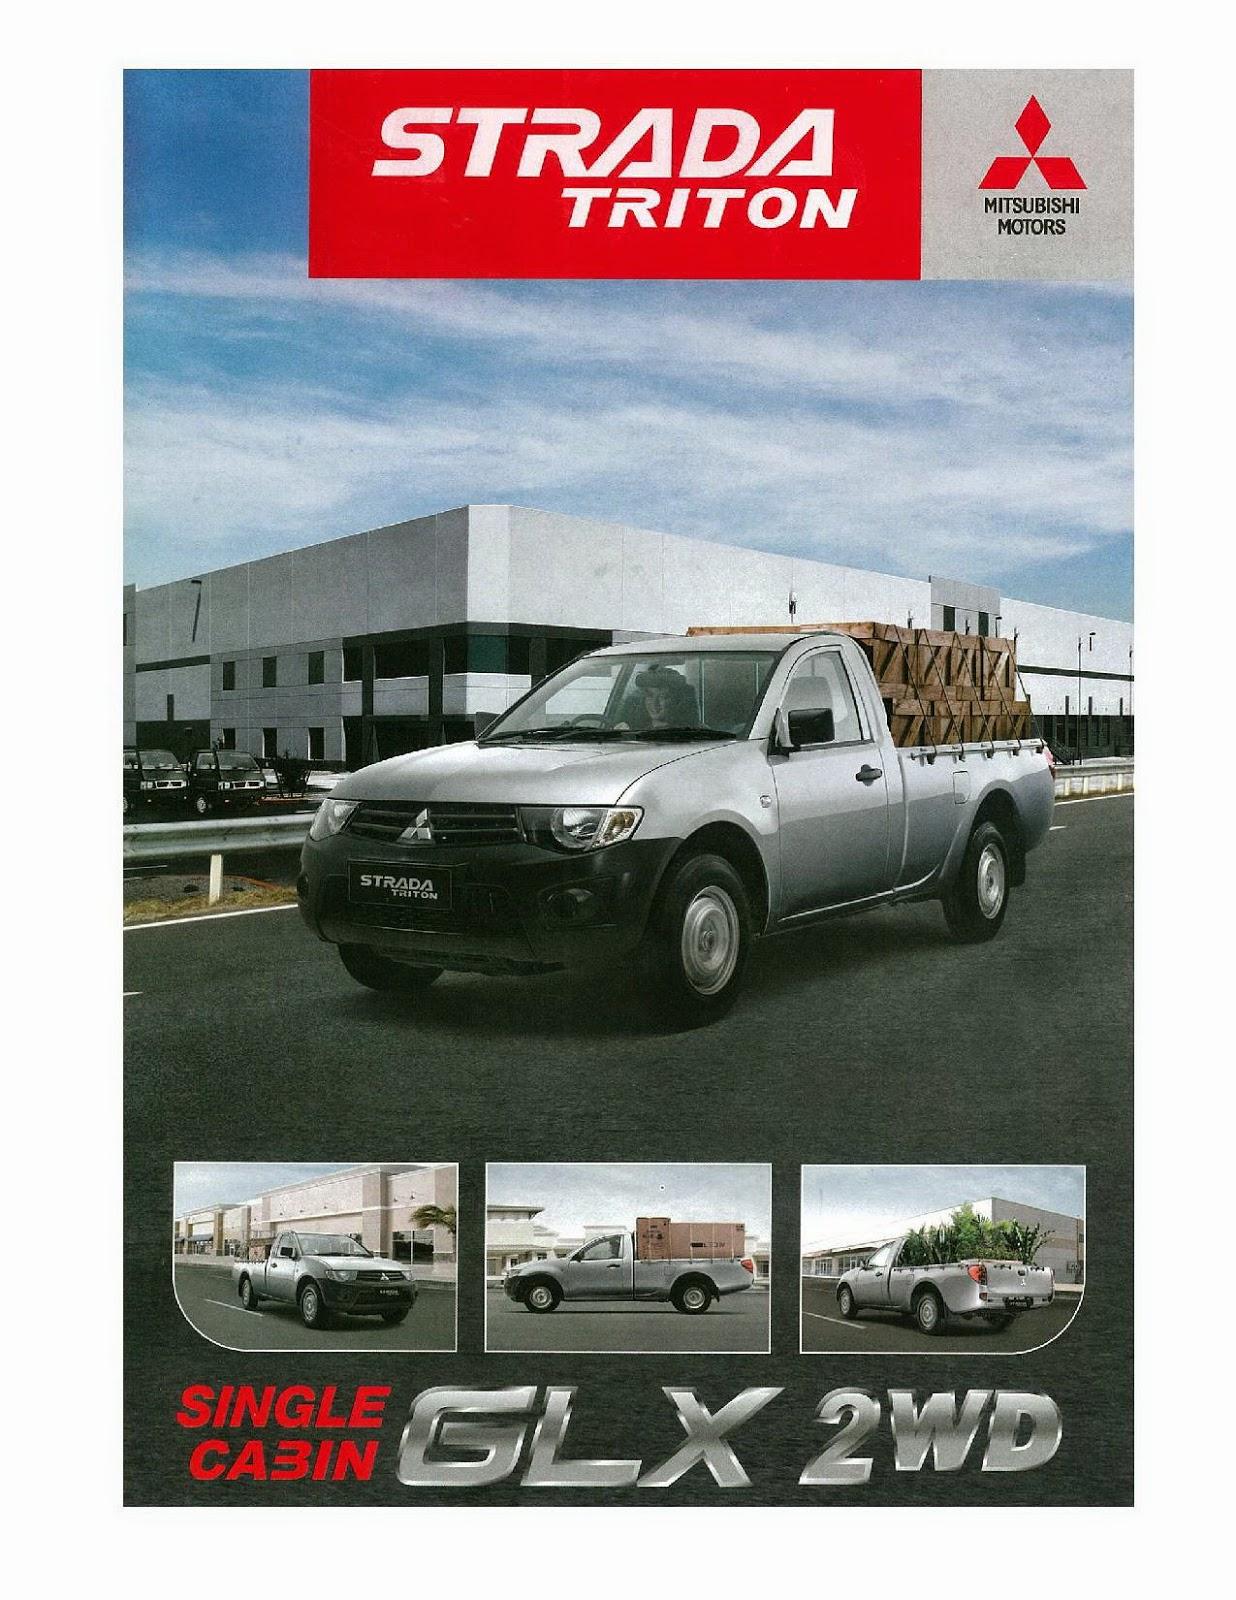 Brosur Mobil Mitsubishi Strada Triton 2014